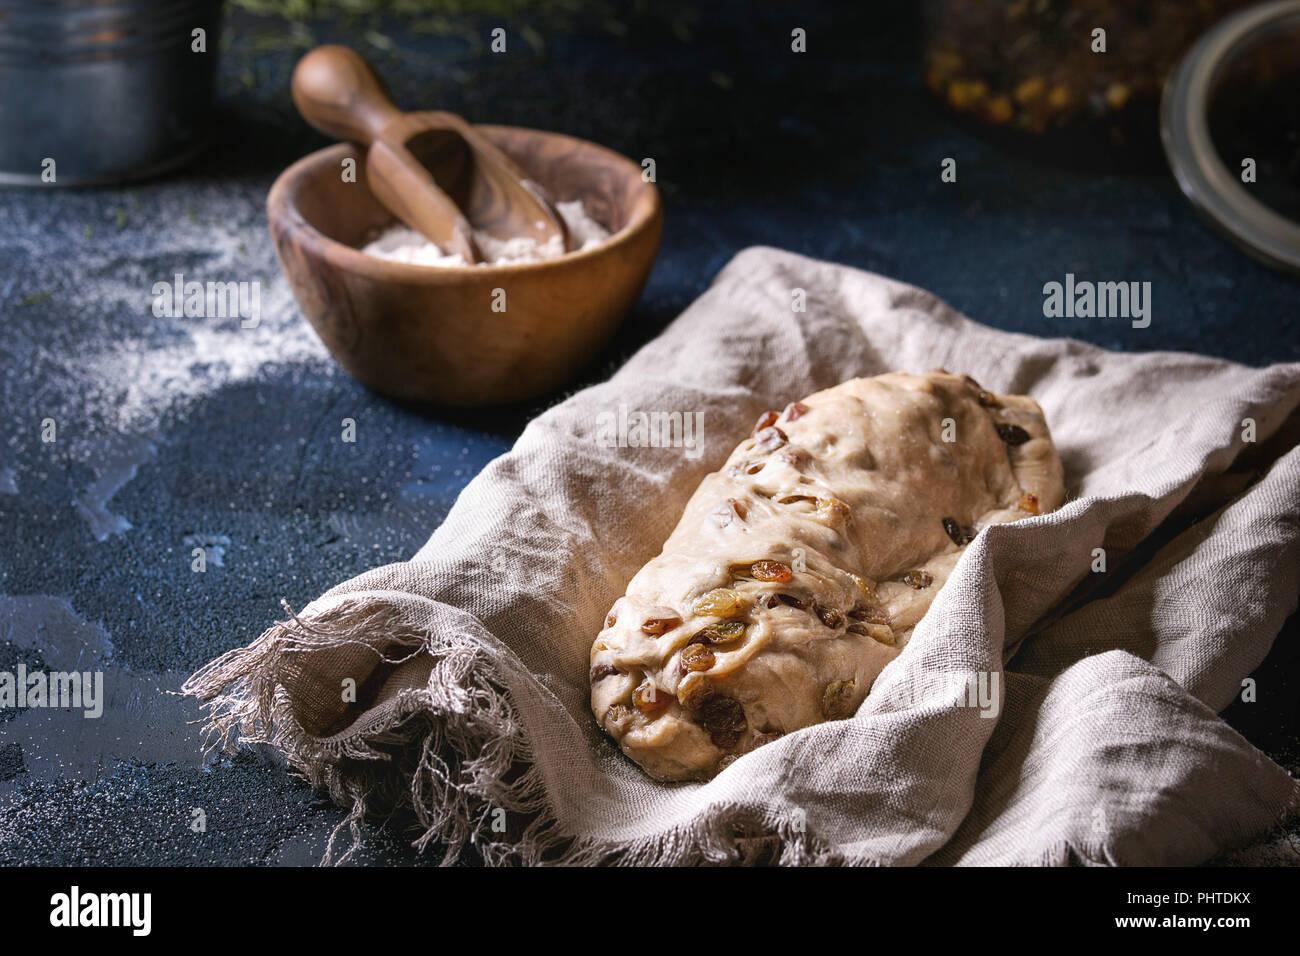 christmas cake traditional german festive baking wholegrain dough stollen preparation on linen napkin with bowls of flour raisins fir tree over da